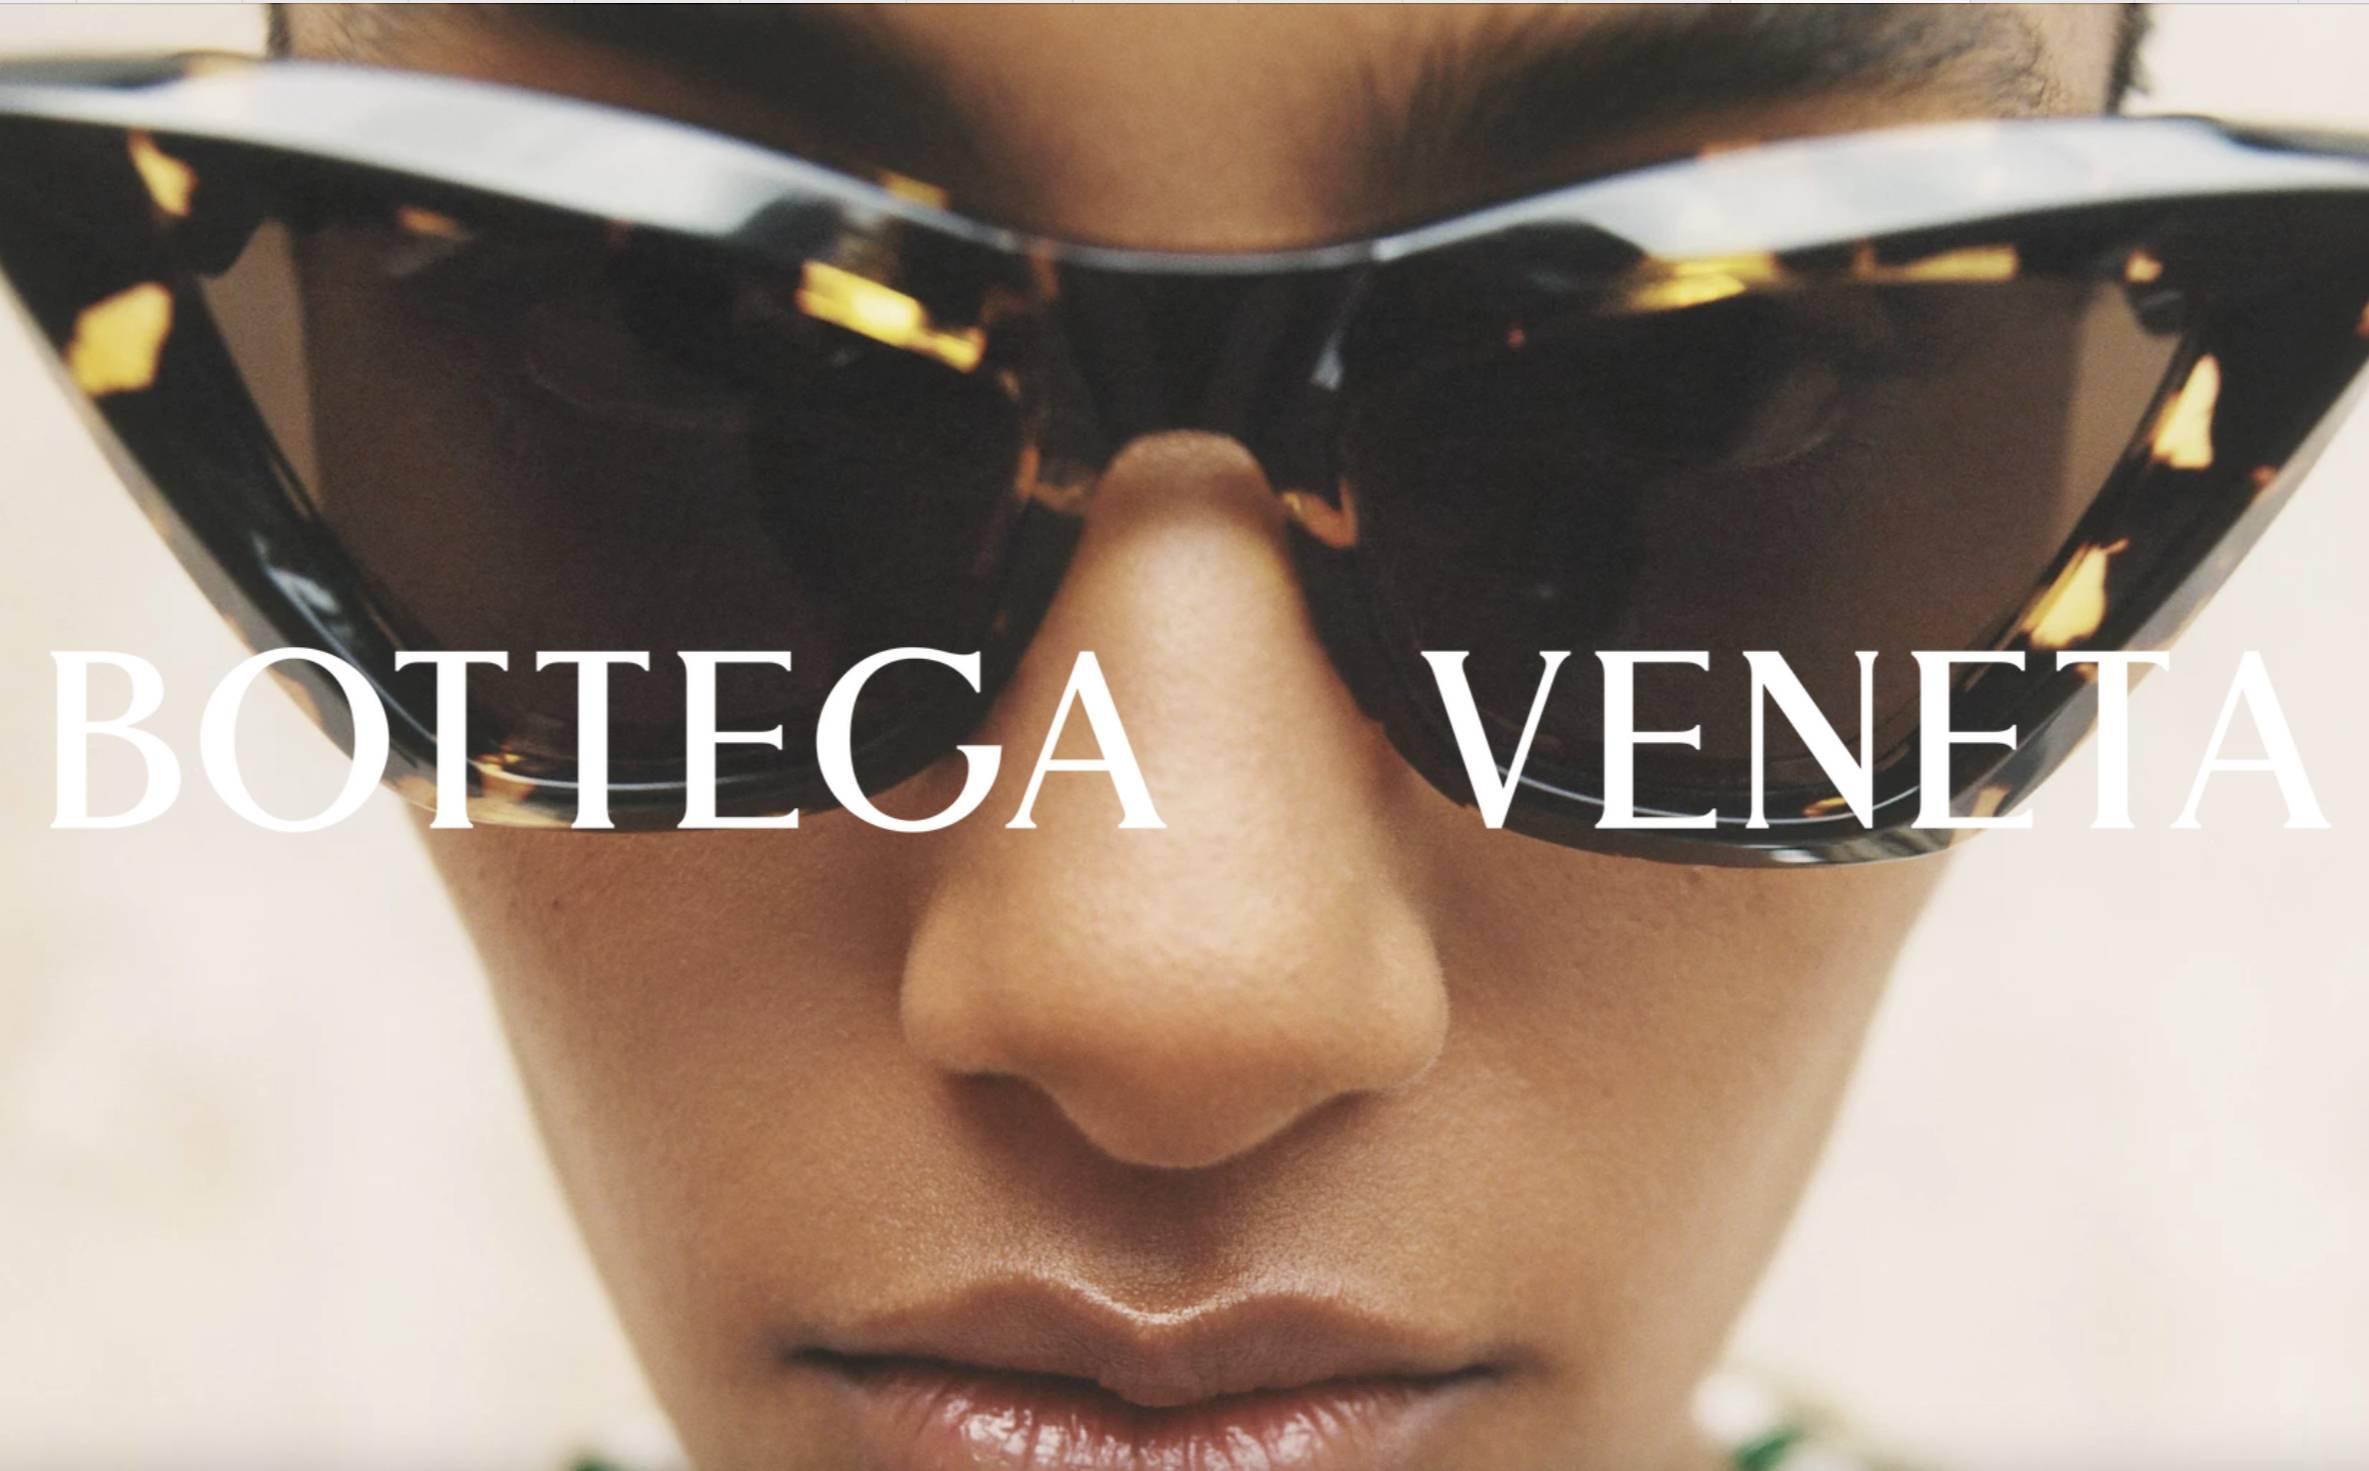 After quitting social media, Bottega Veneta launches digital magazine